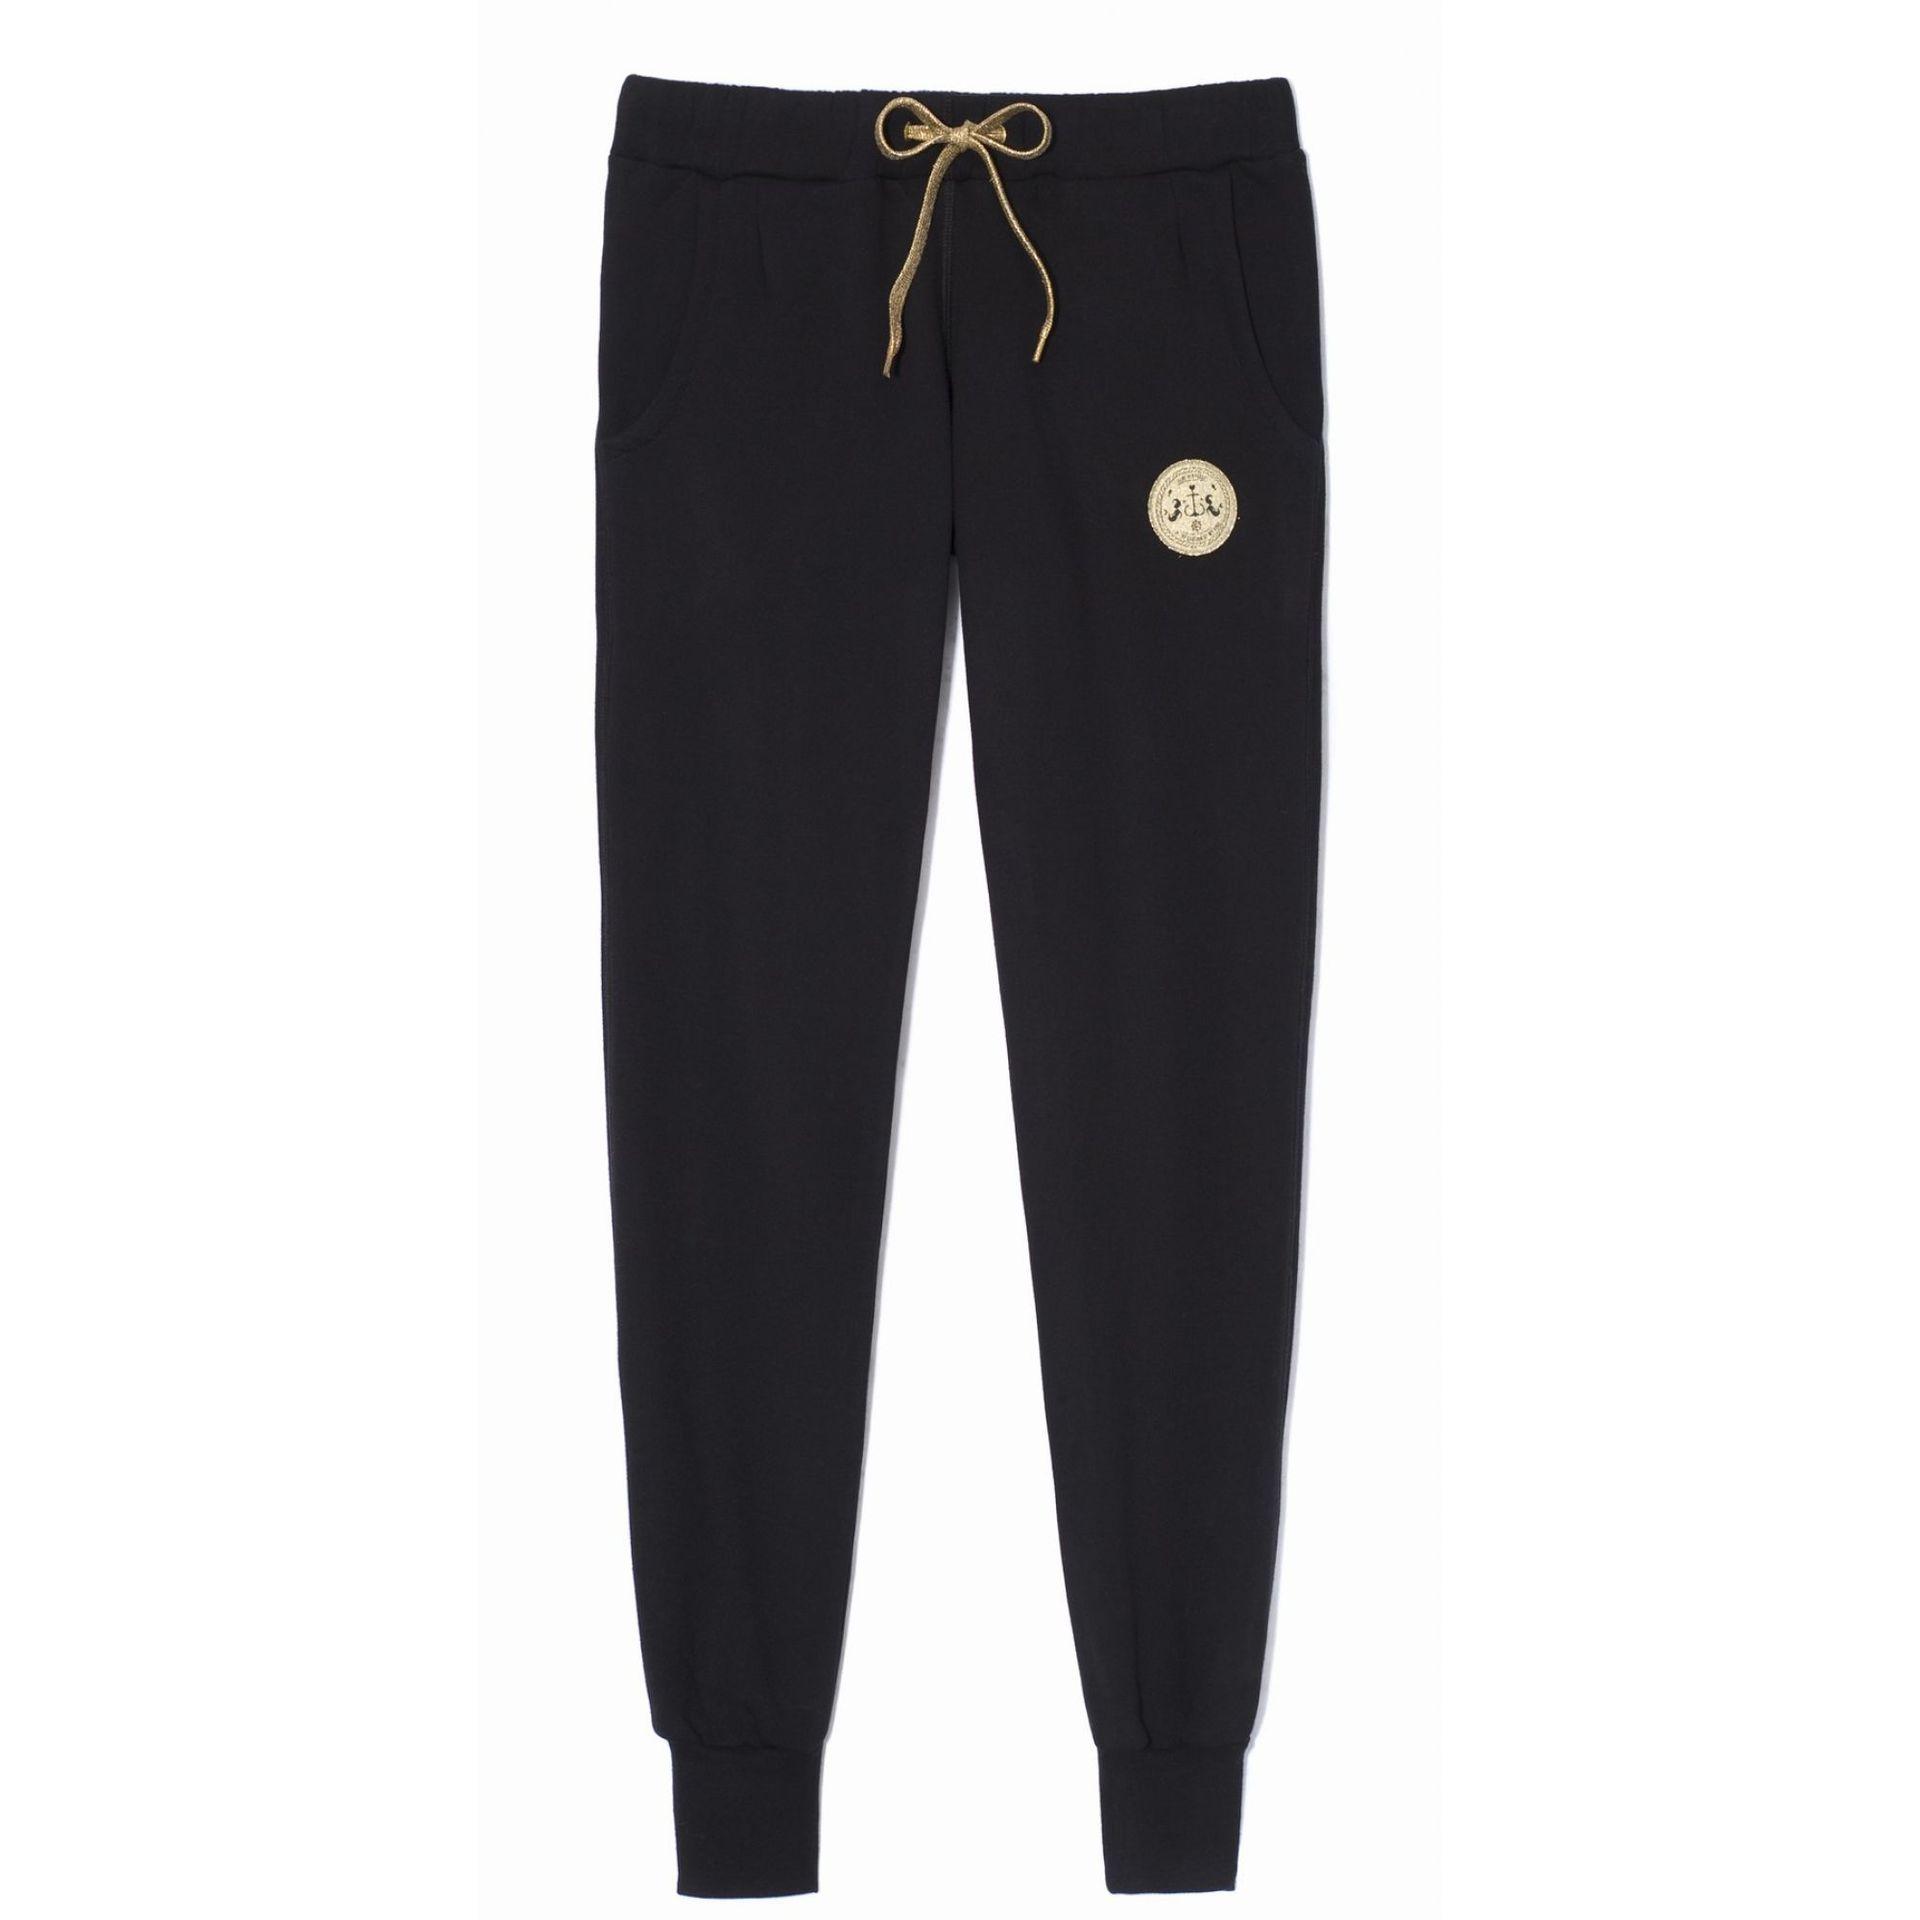 Spodnie Femi Pleasure Rhodos czarne